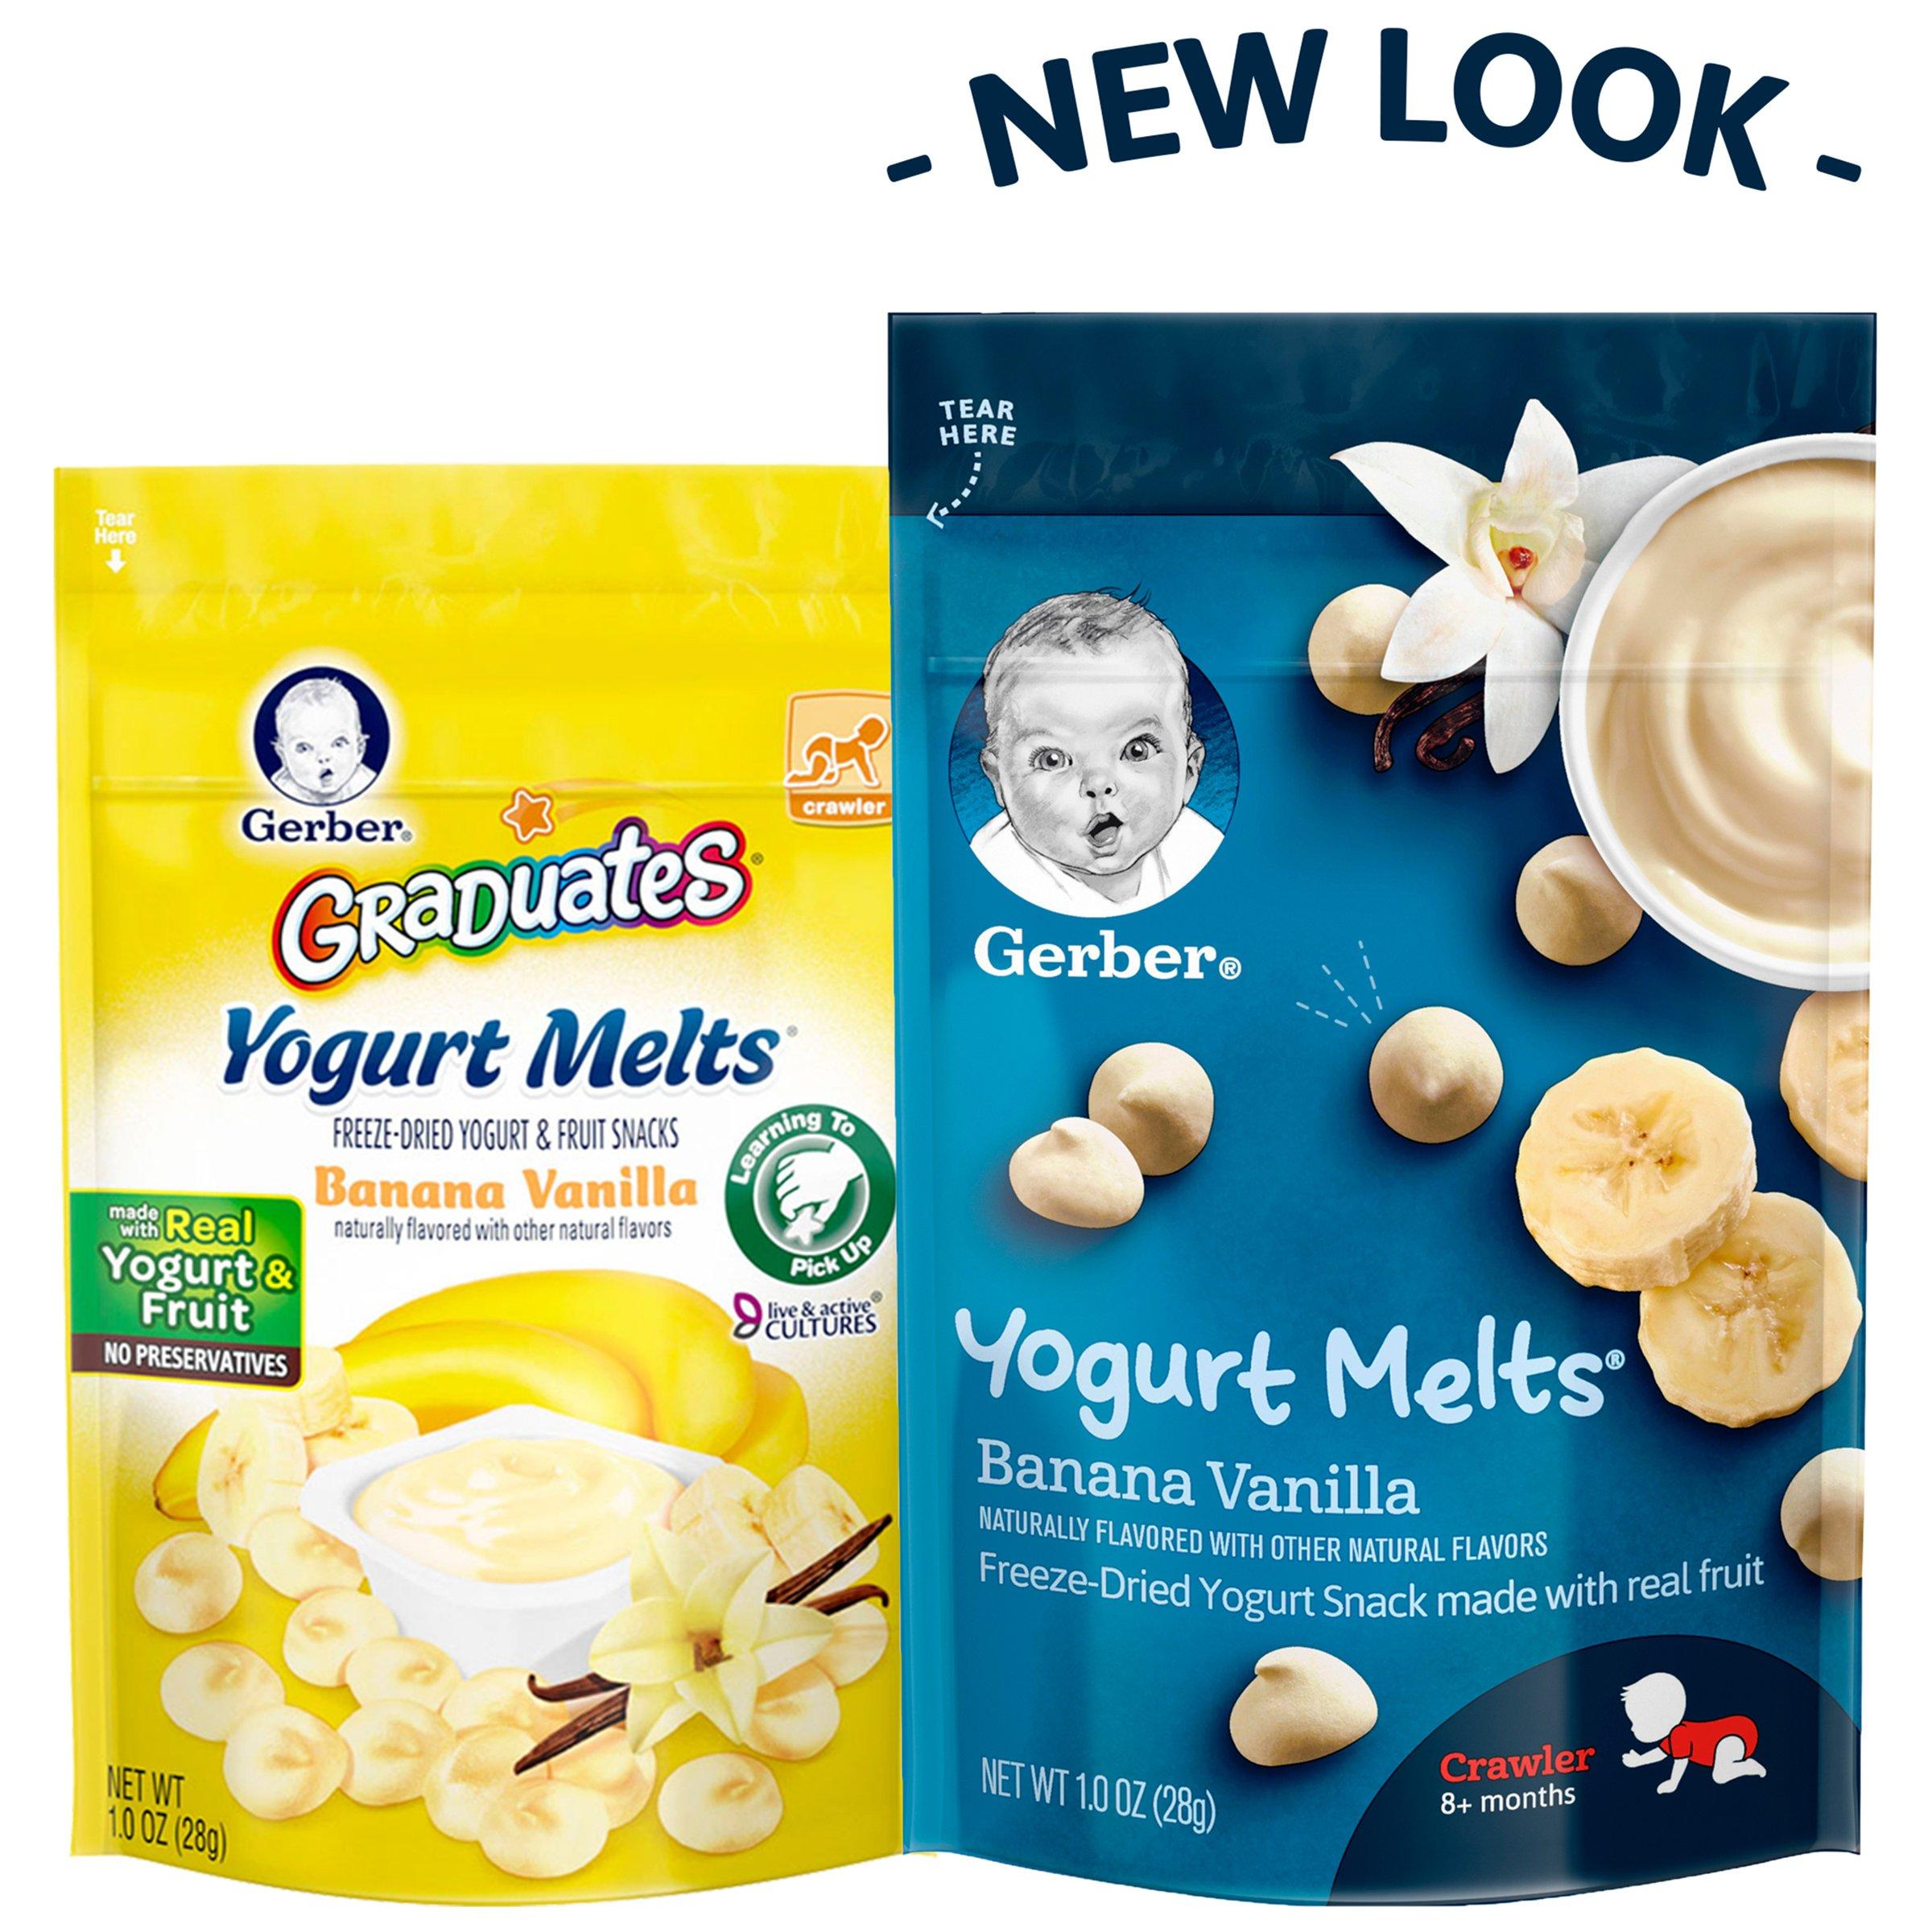 Gerber Yogurt Melts Freeze-Dried Yogurt Snack made with real fruit, Banana Vanilla, 1 oz (Pack of 7) by Gerber Graduates (Image #4)